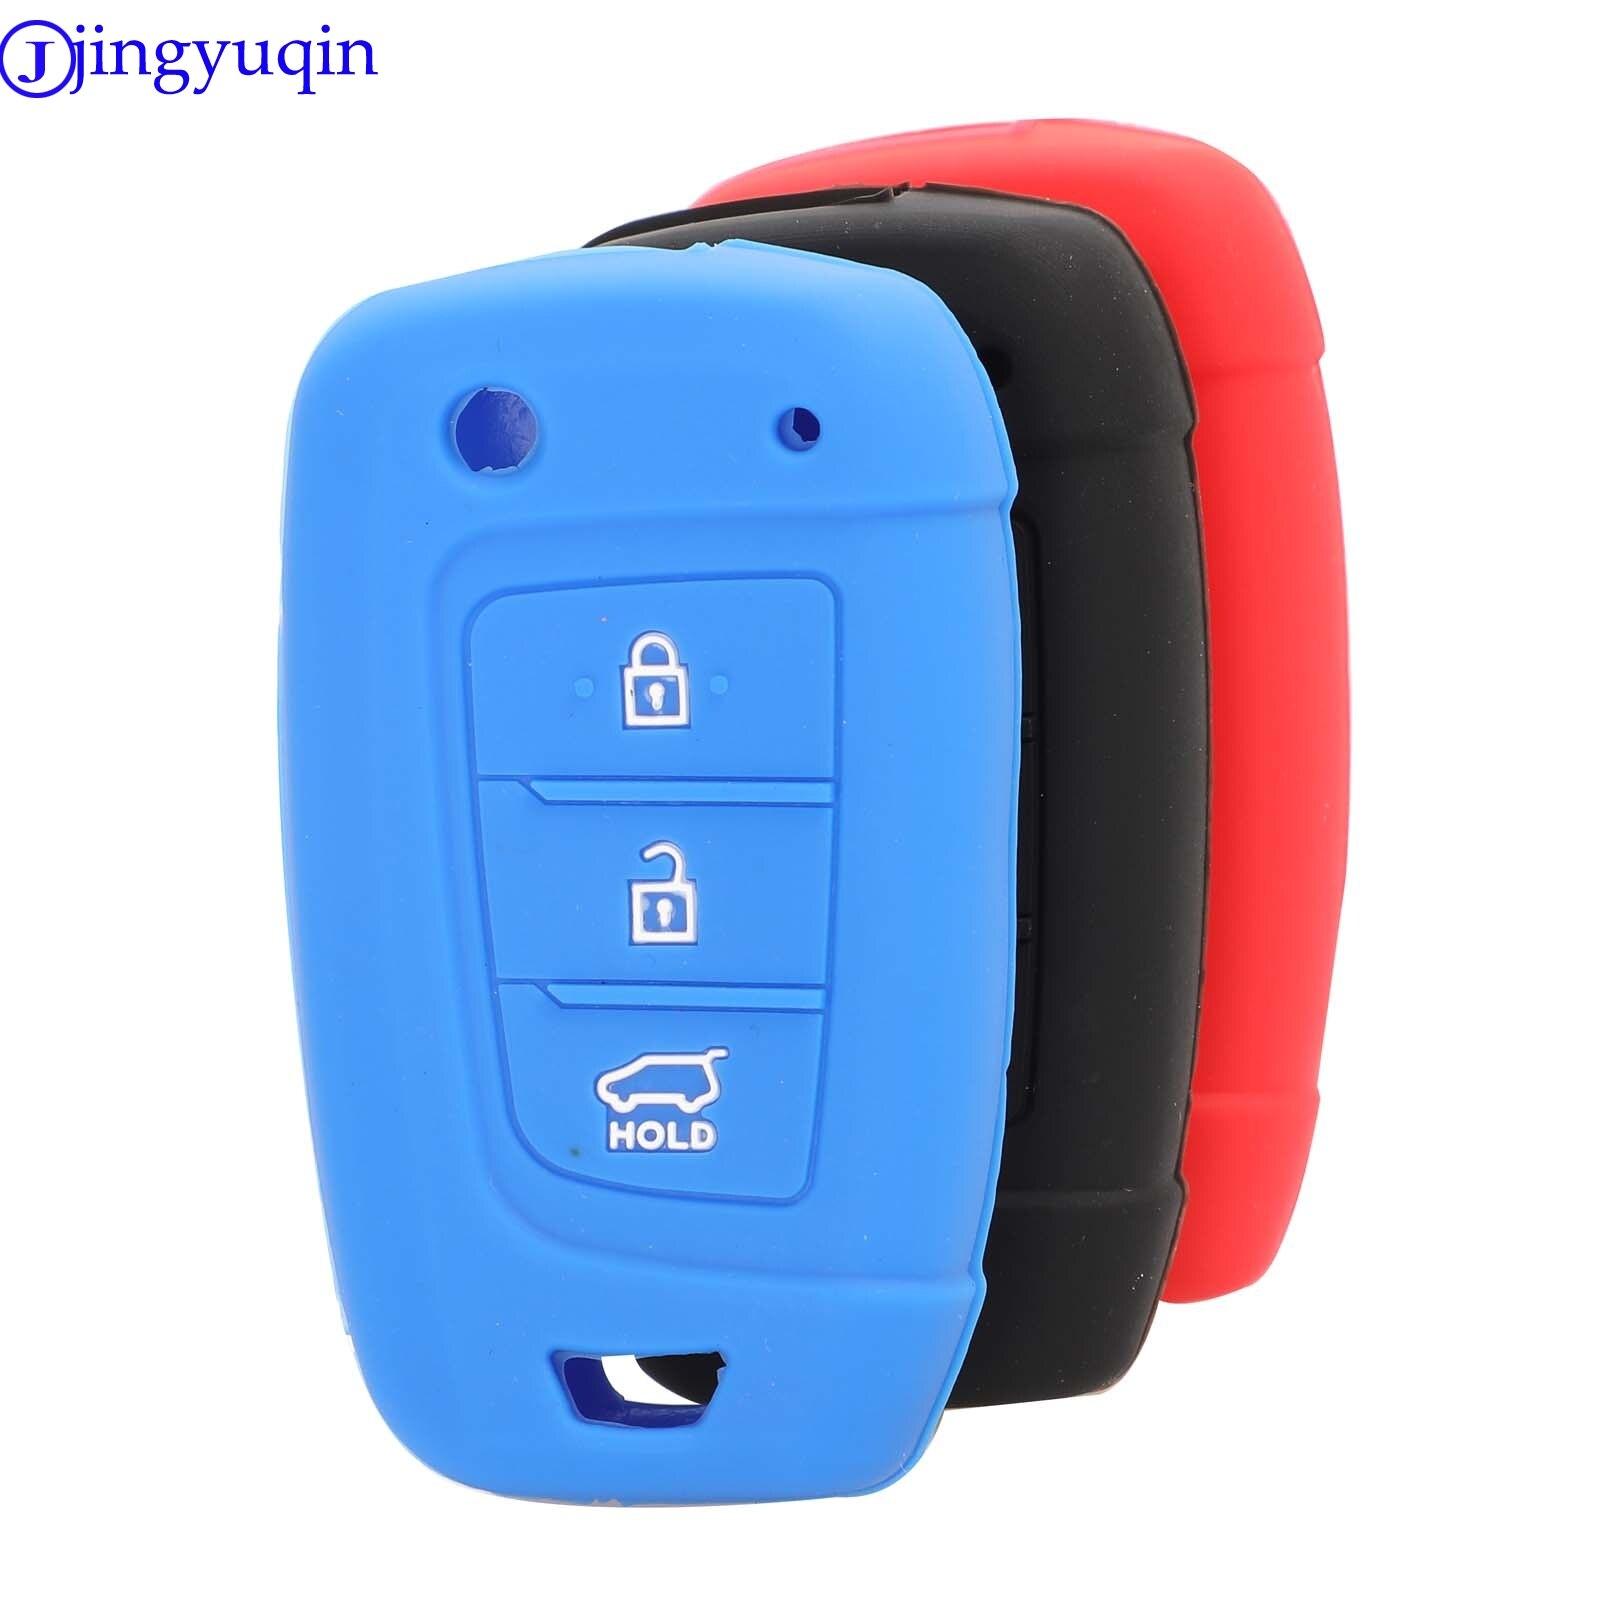 Jingyuqin 3 botón silicona remoto clave Shell caso de la cubierta para Hyundai Solaris 2 Elantra i30 i35 i40 Tucson Kona 2015 2016, 2017, 2018,